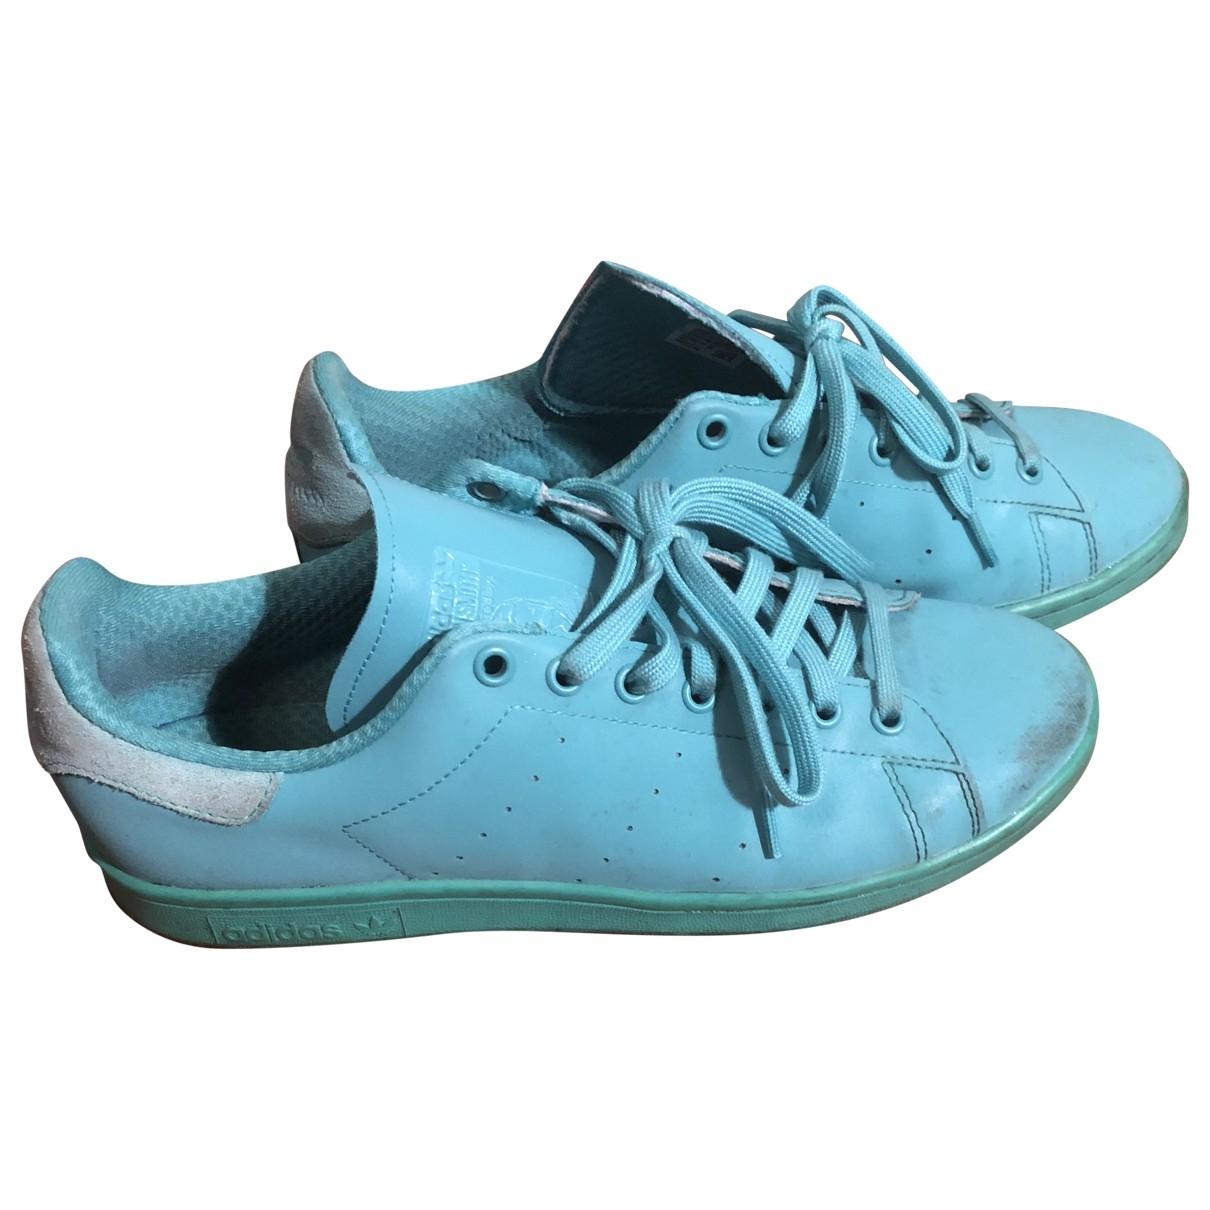 Adidas Stan Smith Sneakers in Kautschuk